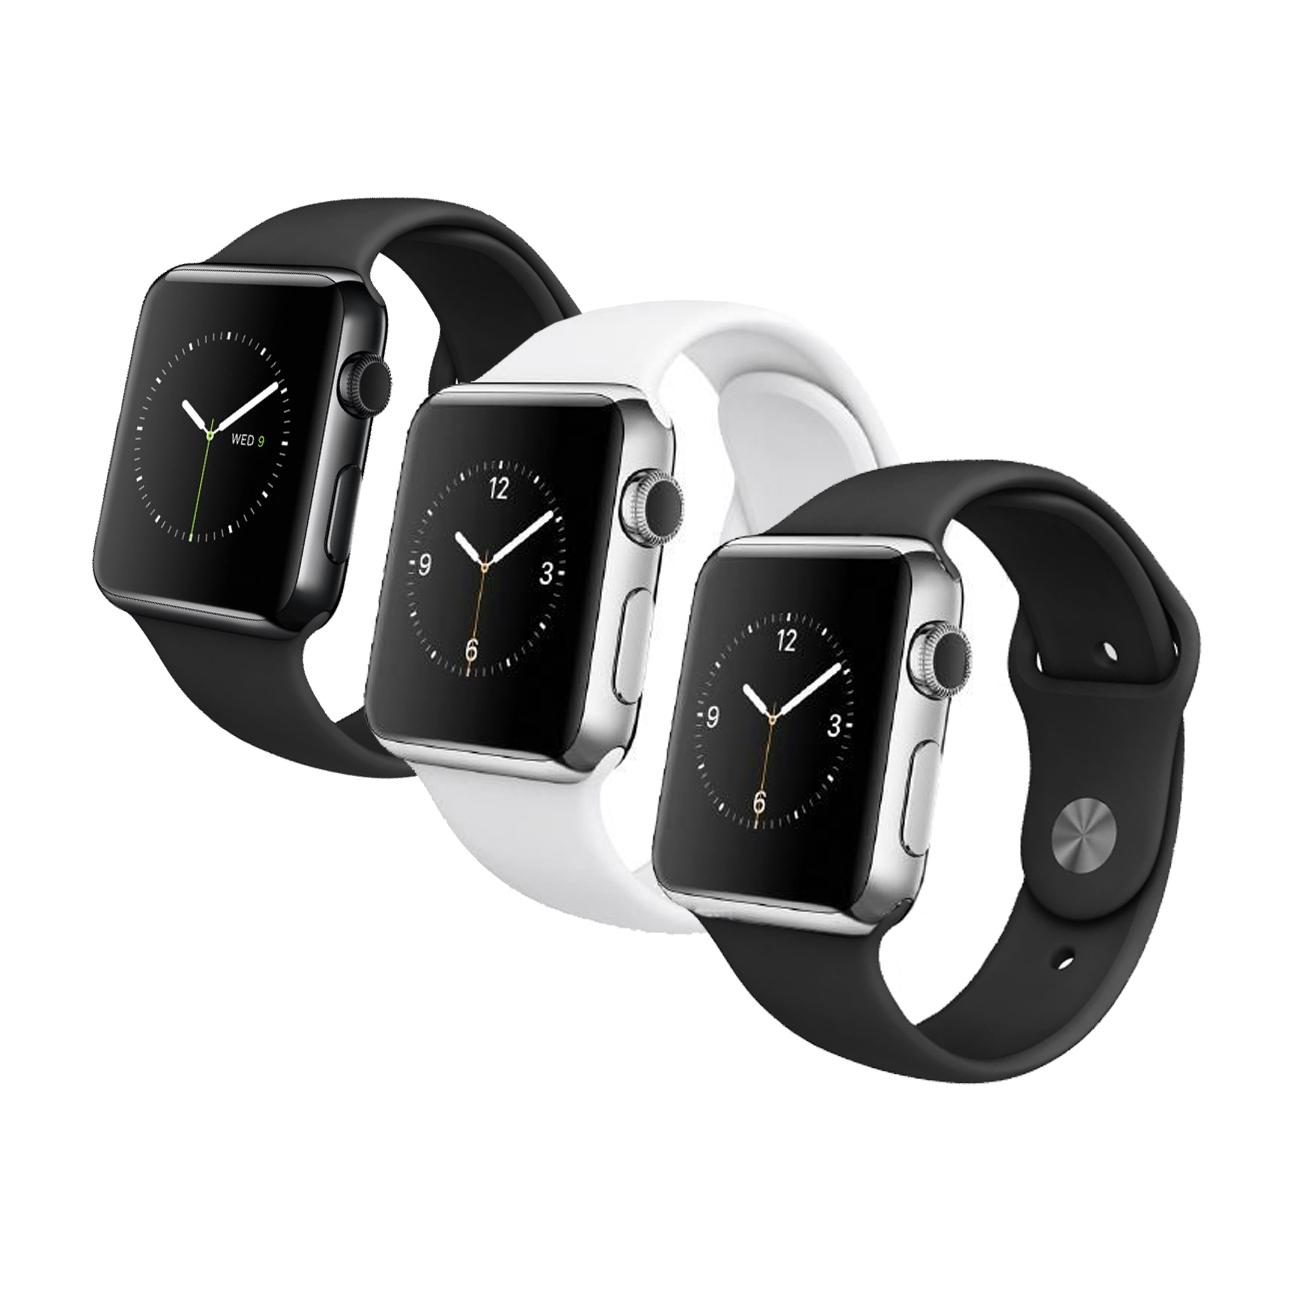 apple watch edelstahl 38mm 42mm mj3u2fd a ios smartwatch. Black Bedroom Furniture Sets. Home Design Ideas